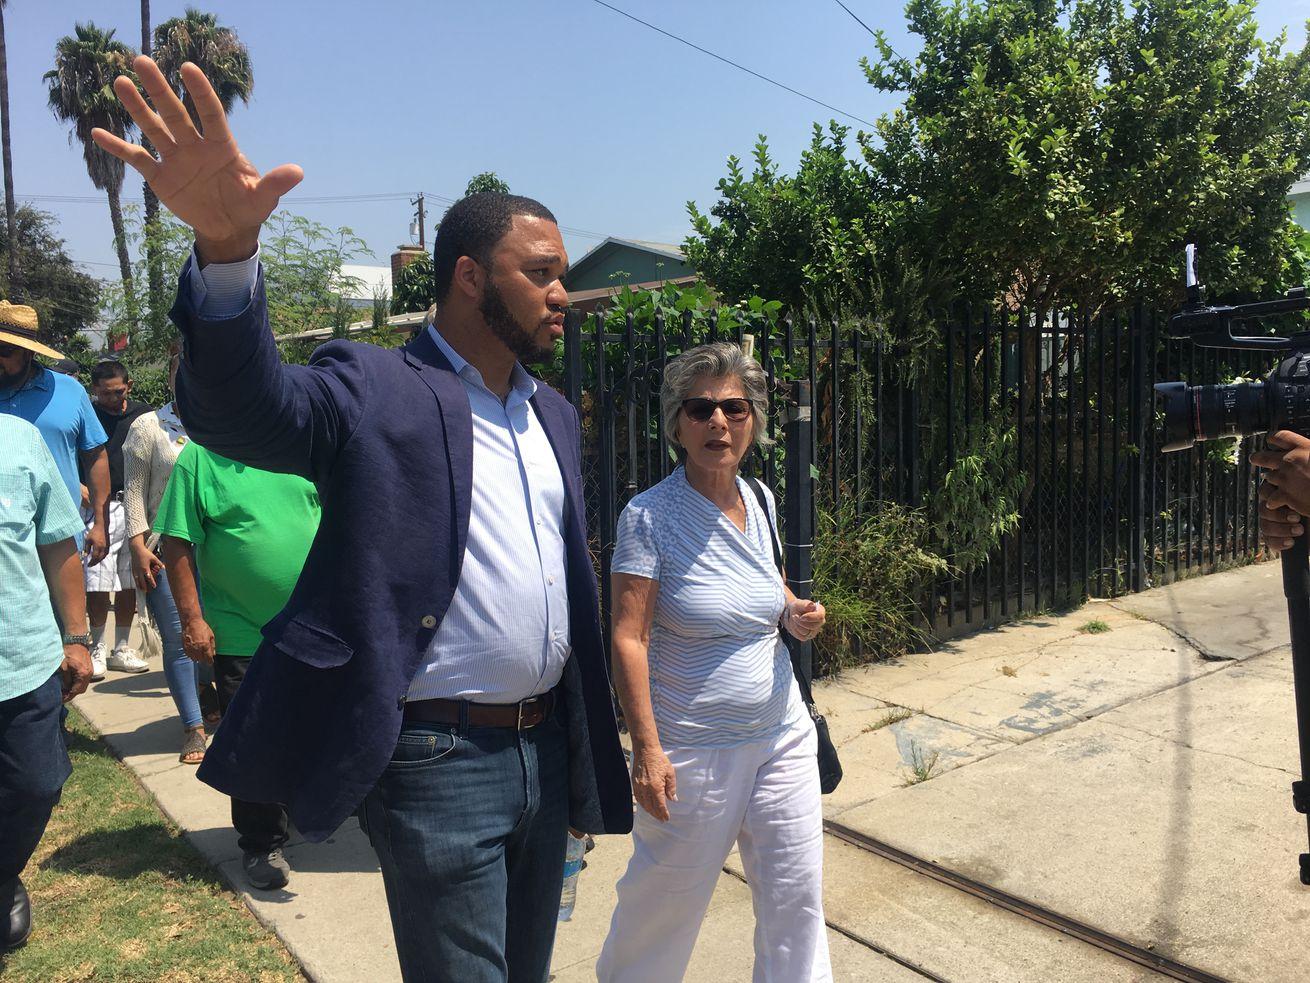 D'Artagnan Scorza, with Uplift Inglewood, walks with former Sen. Barbara Boxer on Doty Avenue.